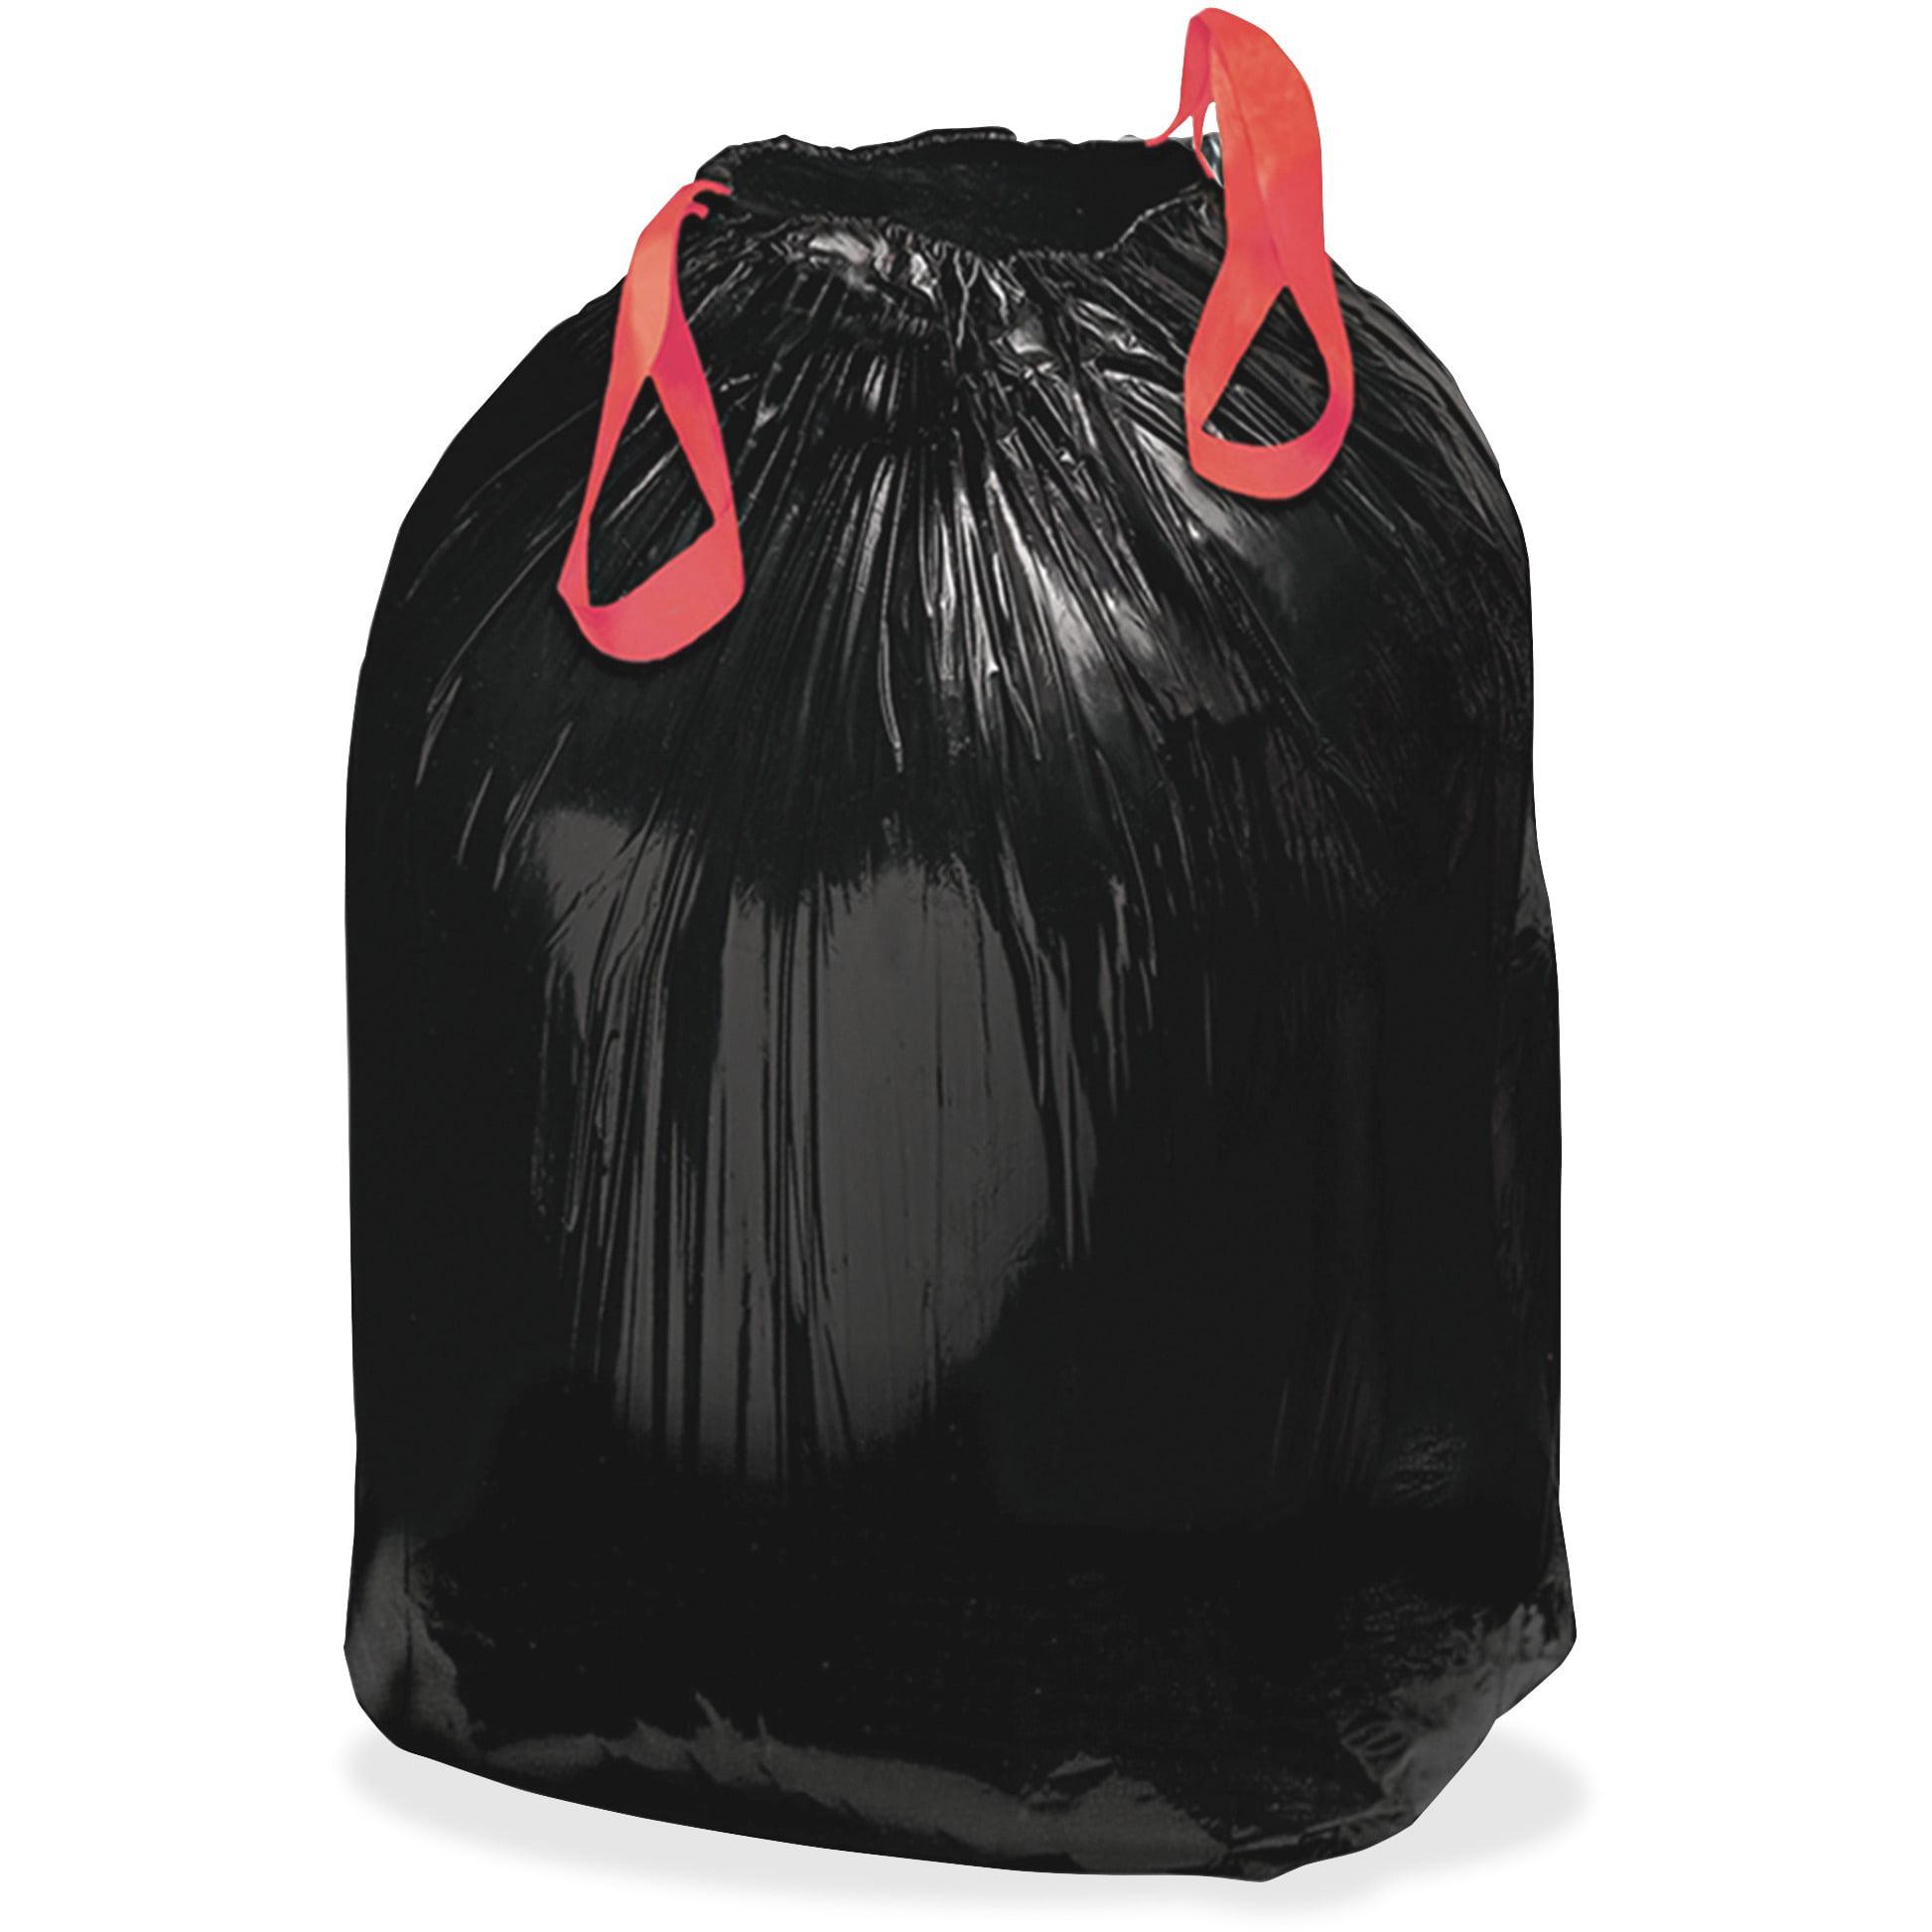 Webster Large Drawstring Trash Bags, 33 Gallon, 150 Count